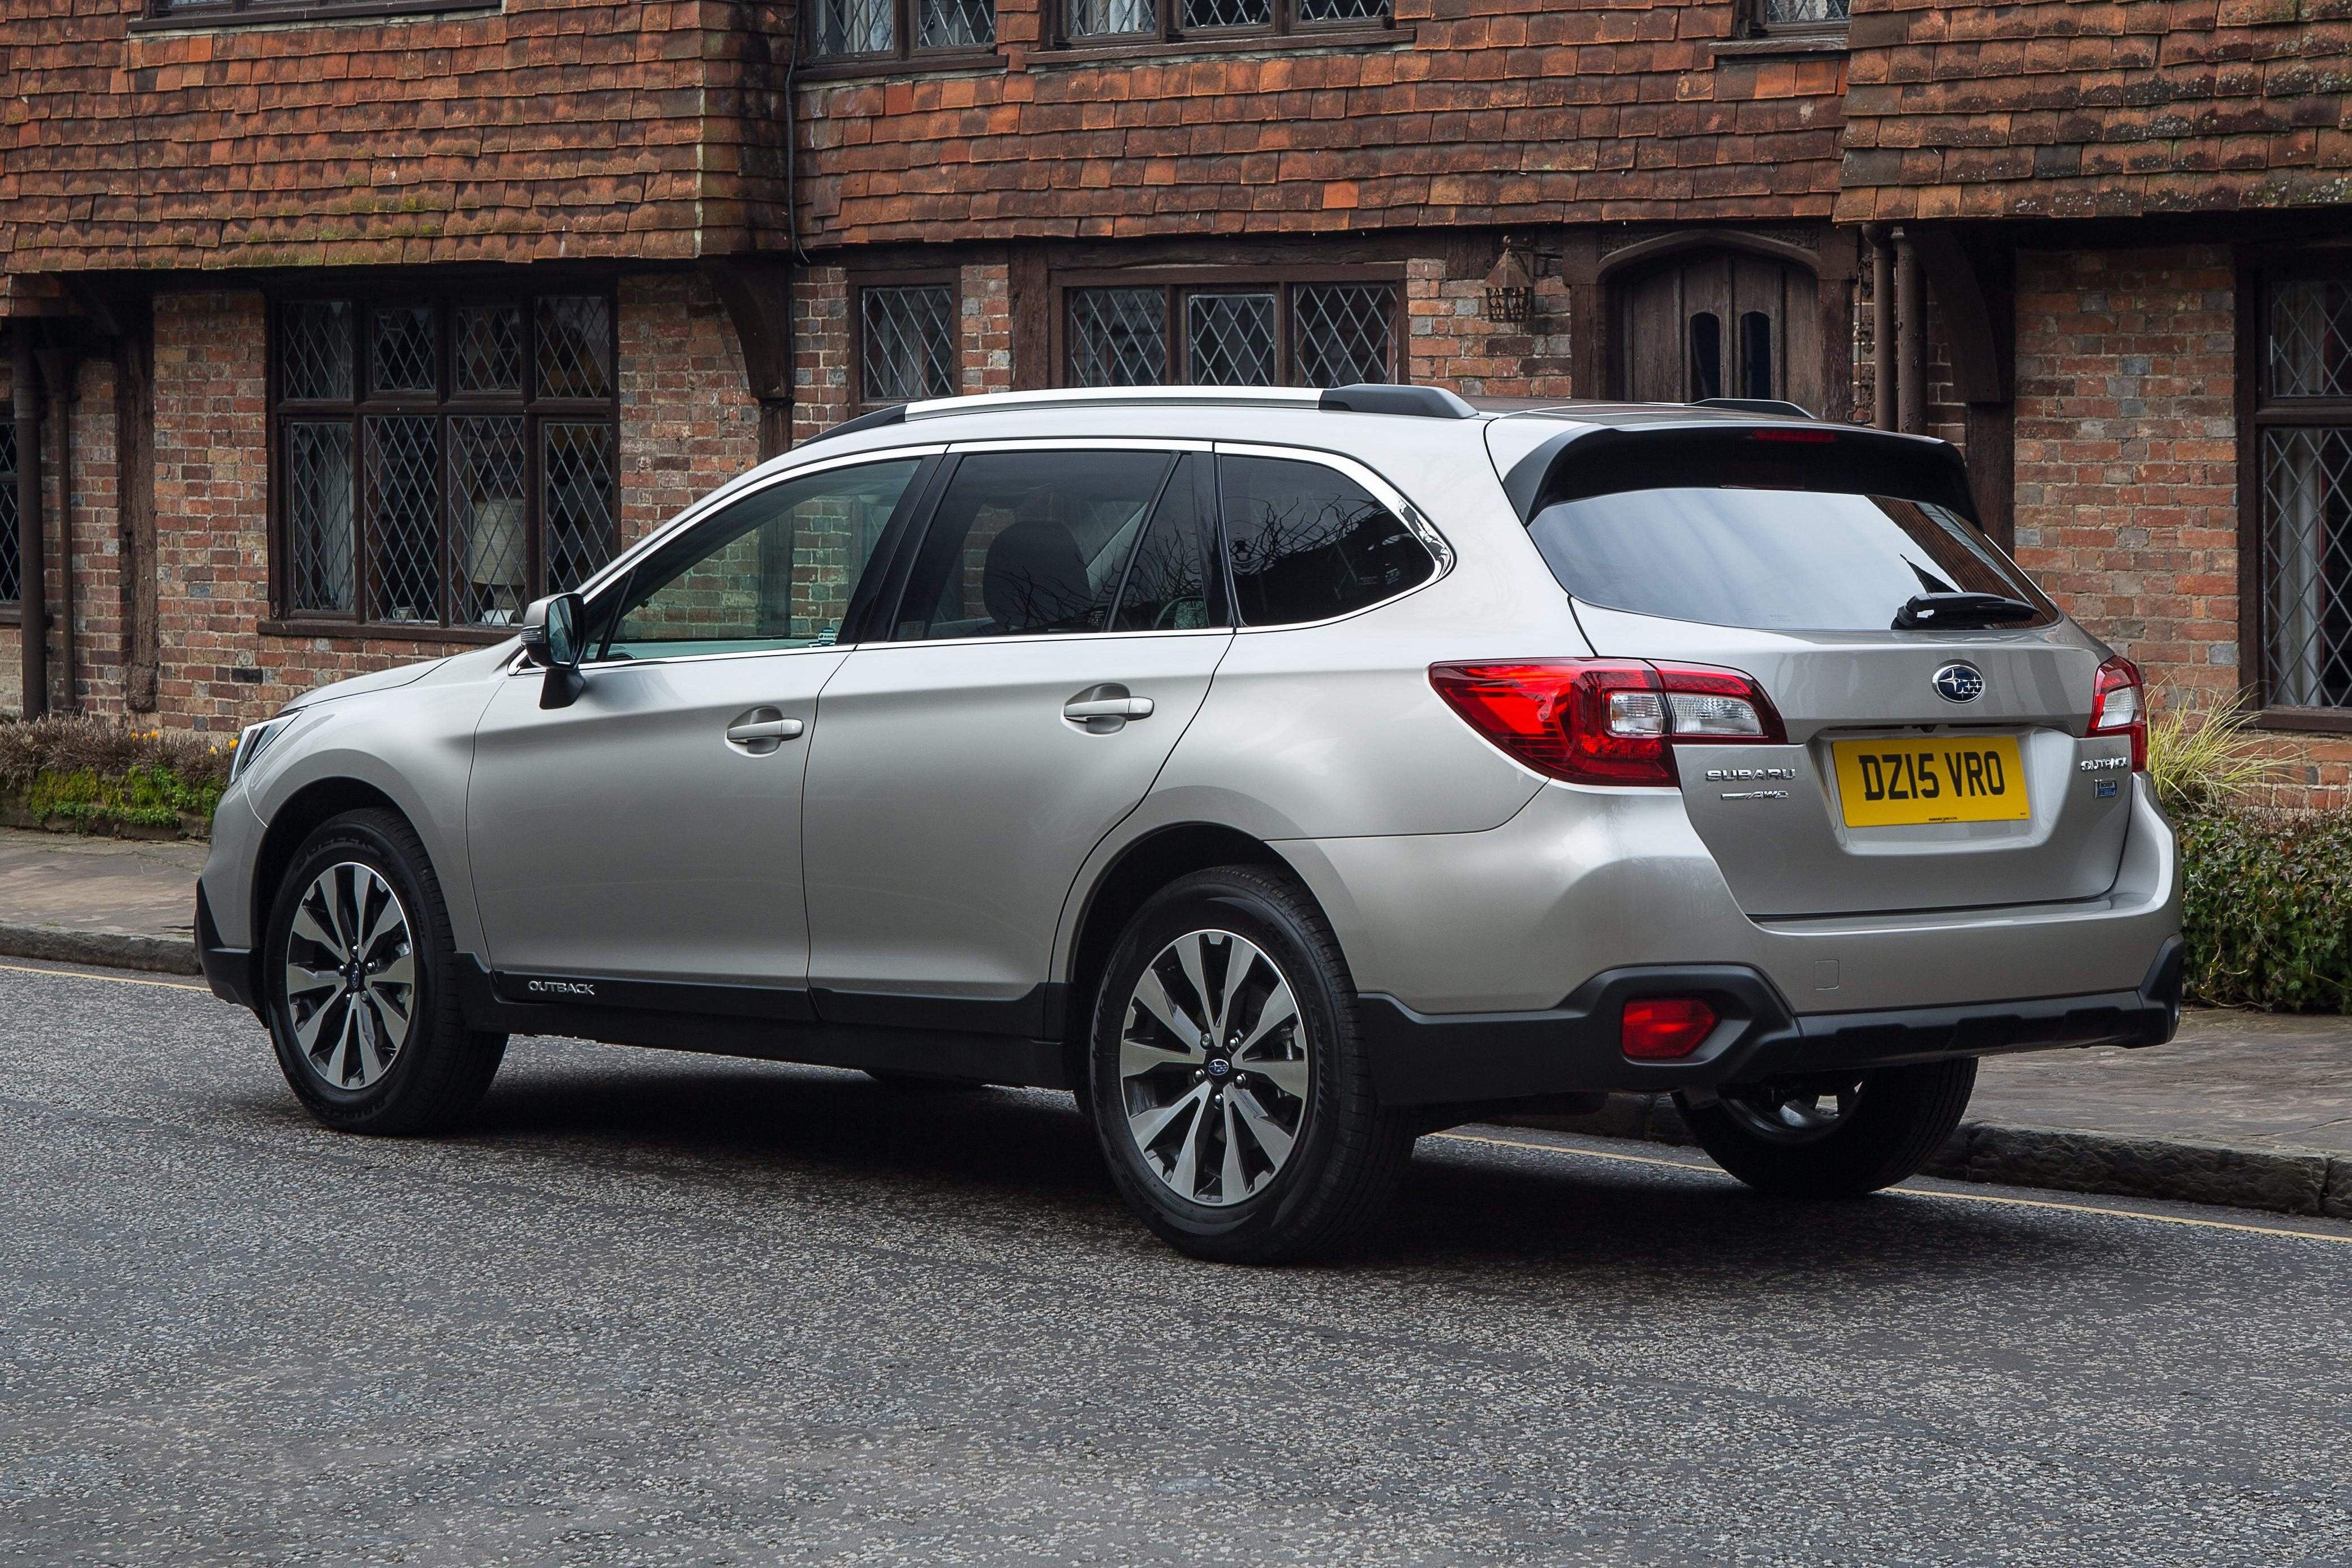 Subaru Outback Rear Side View